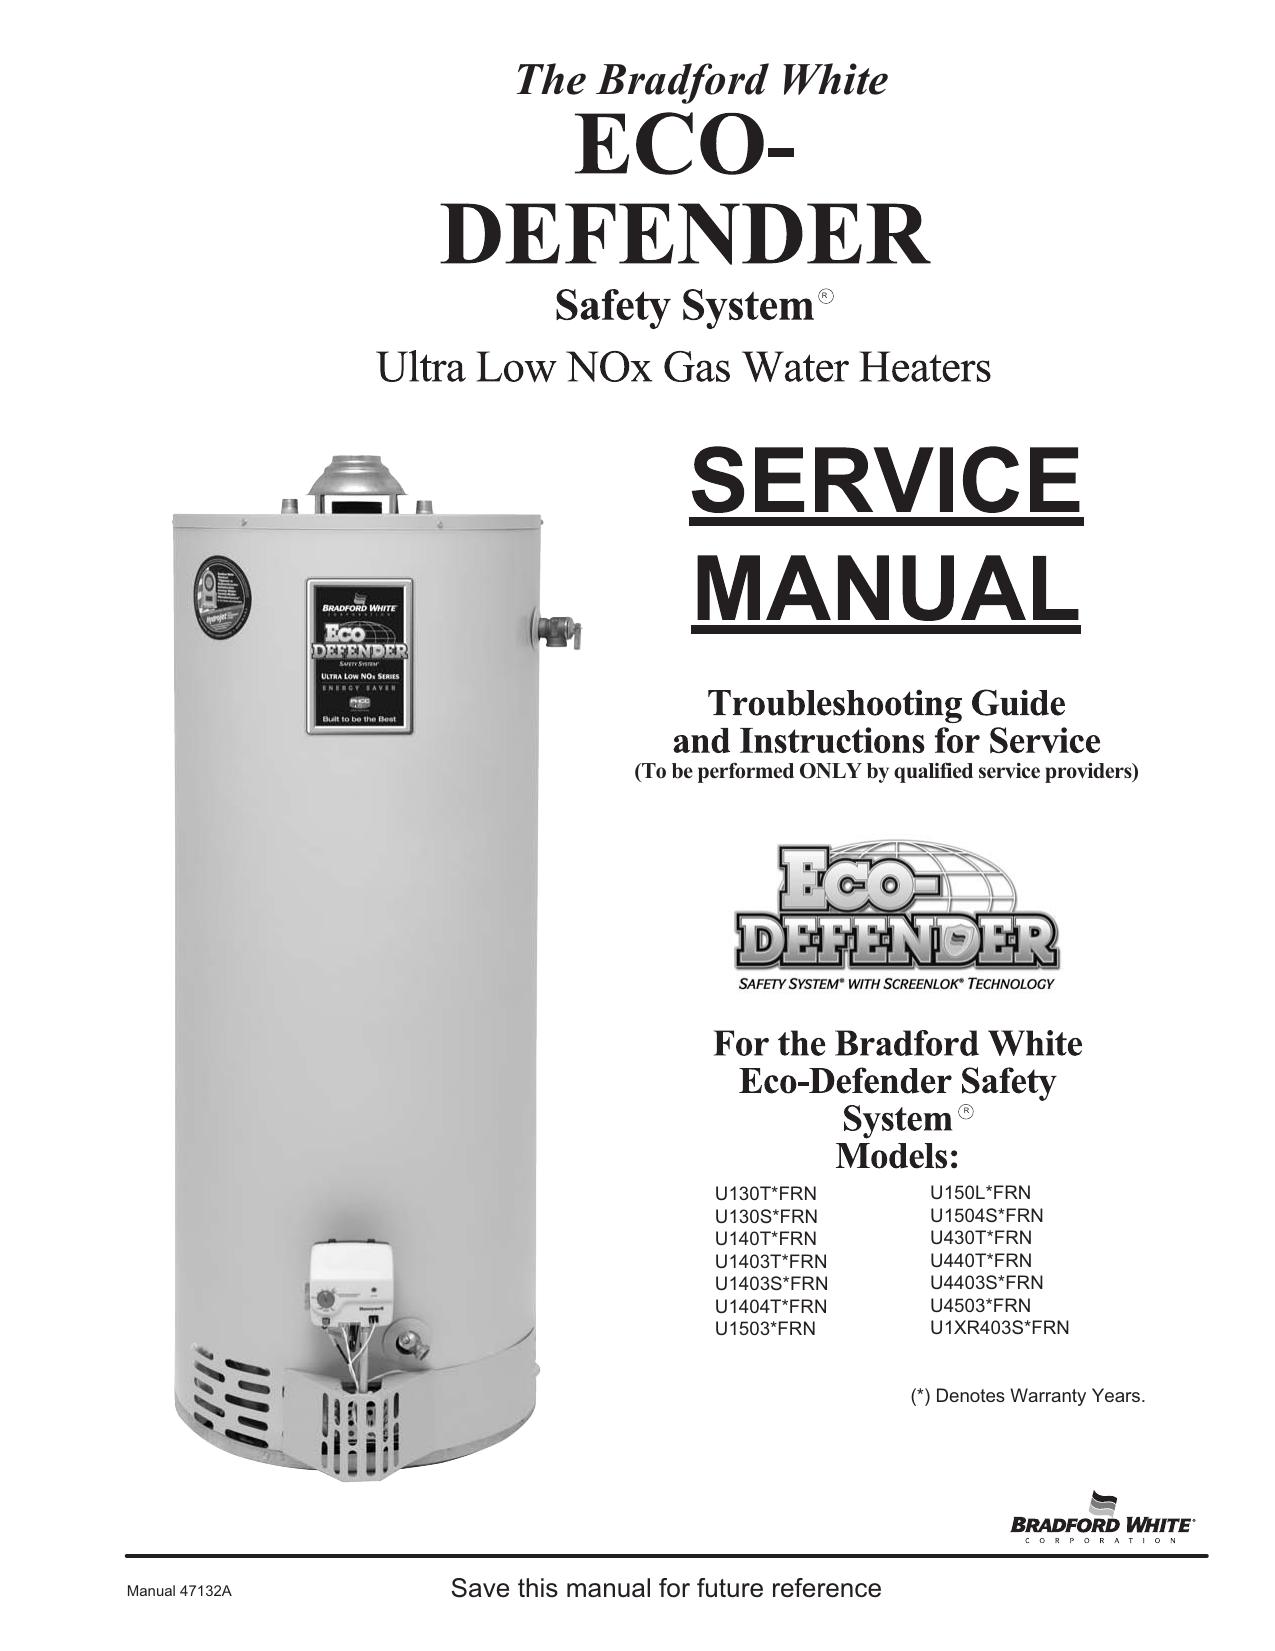 Bradford White Defender Water Heater Manual